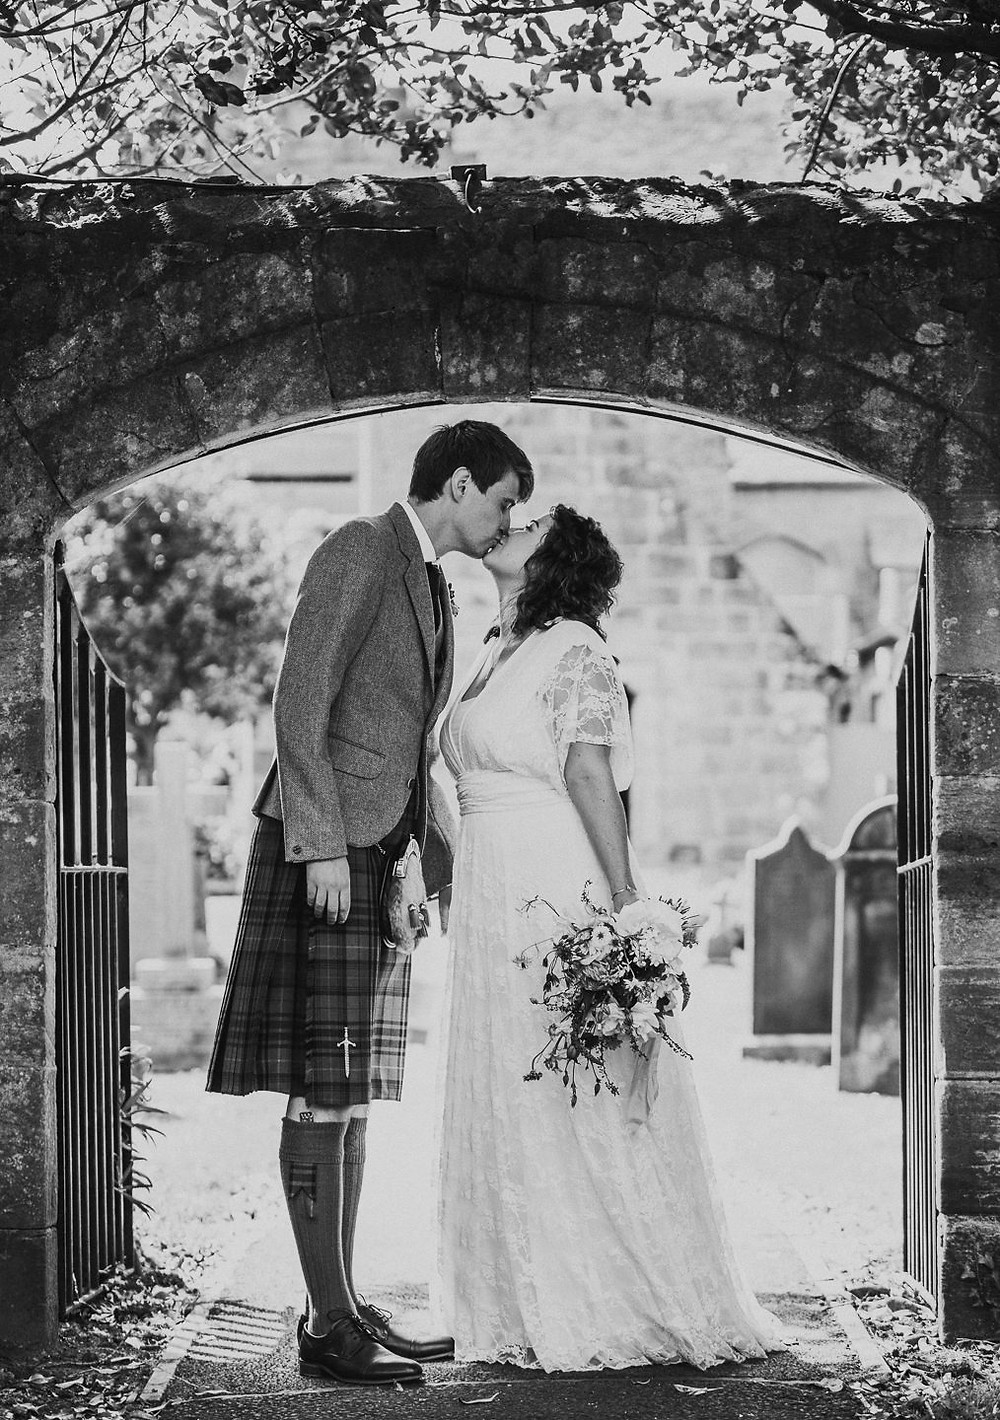 Amy & Mark's sneak peek from their wedding at Cramond Kirk & Fruitmarket Gallery in Edinburgh